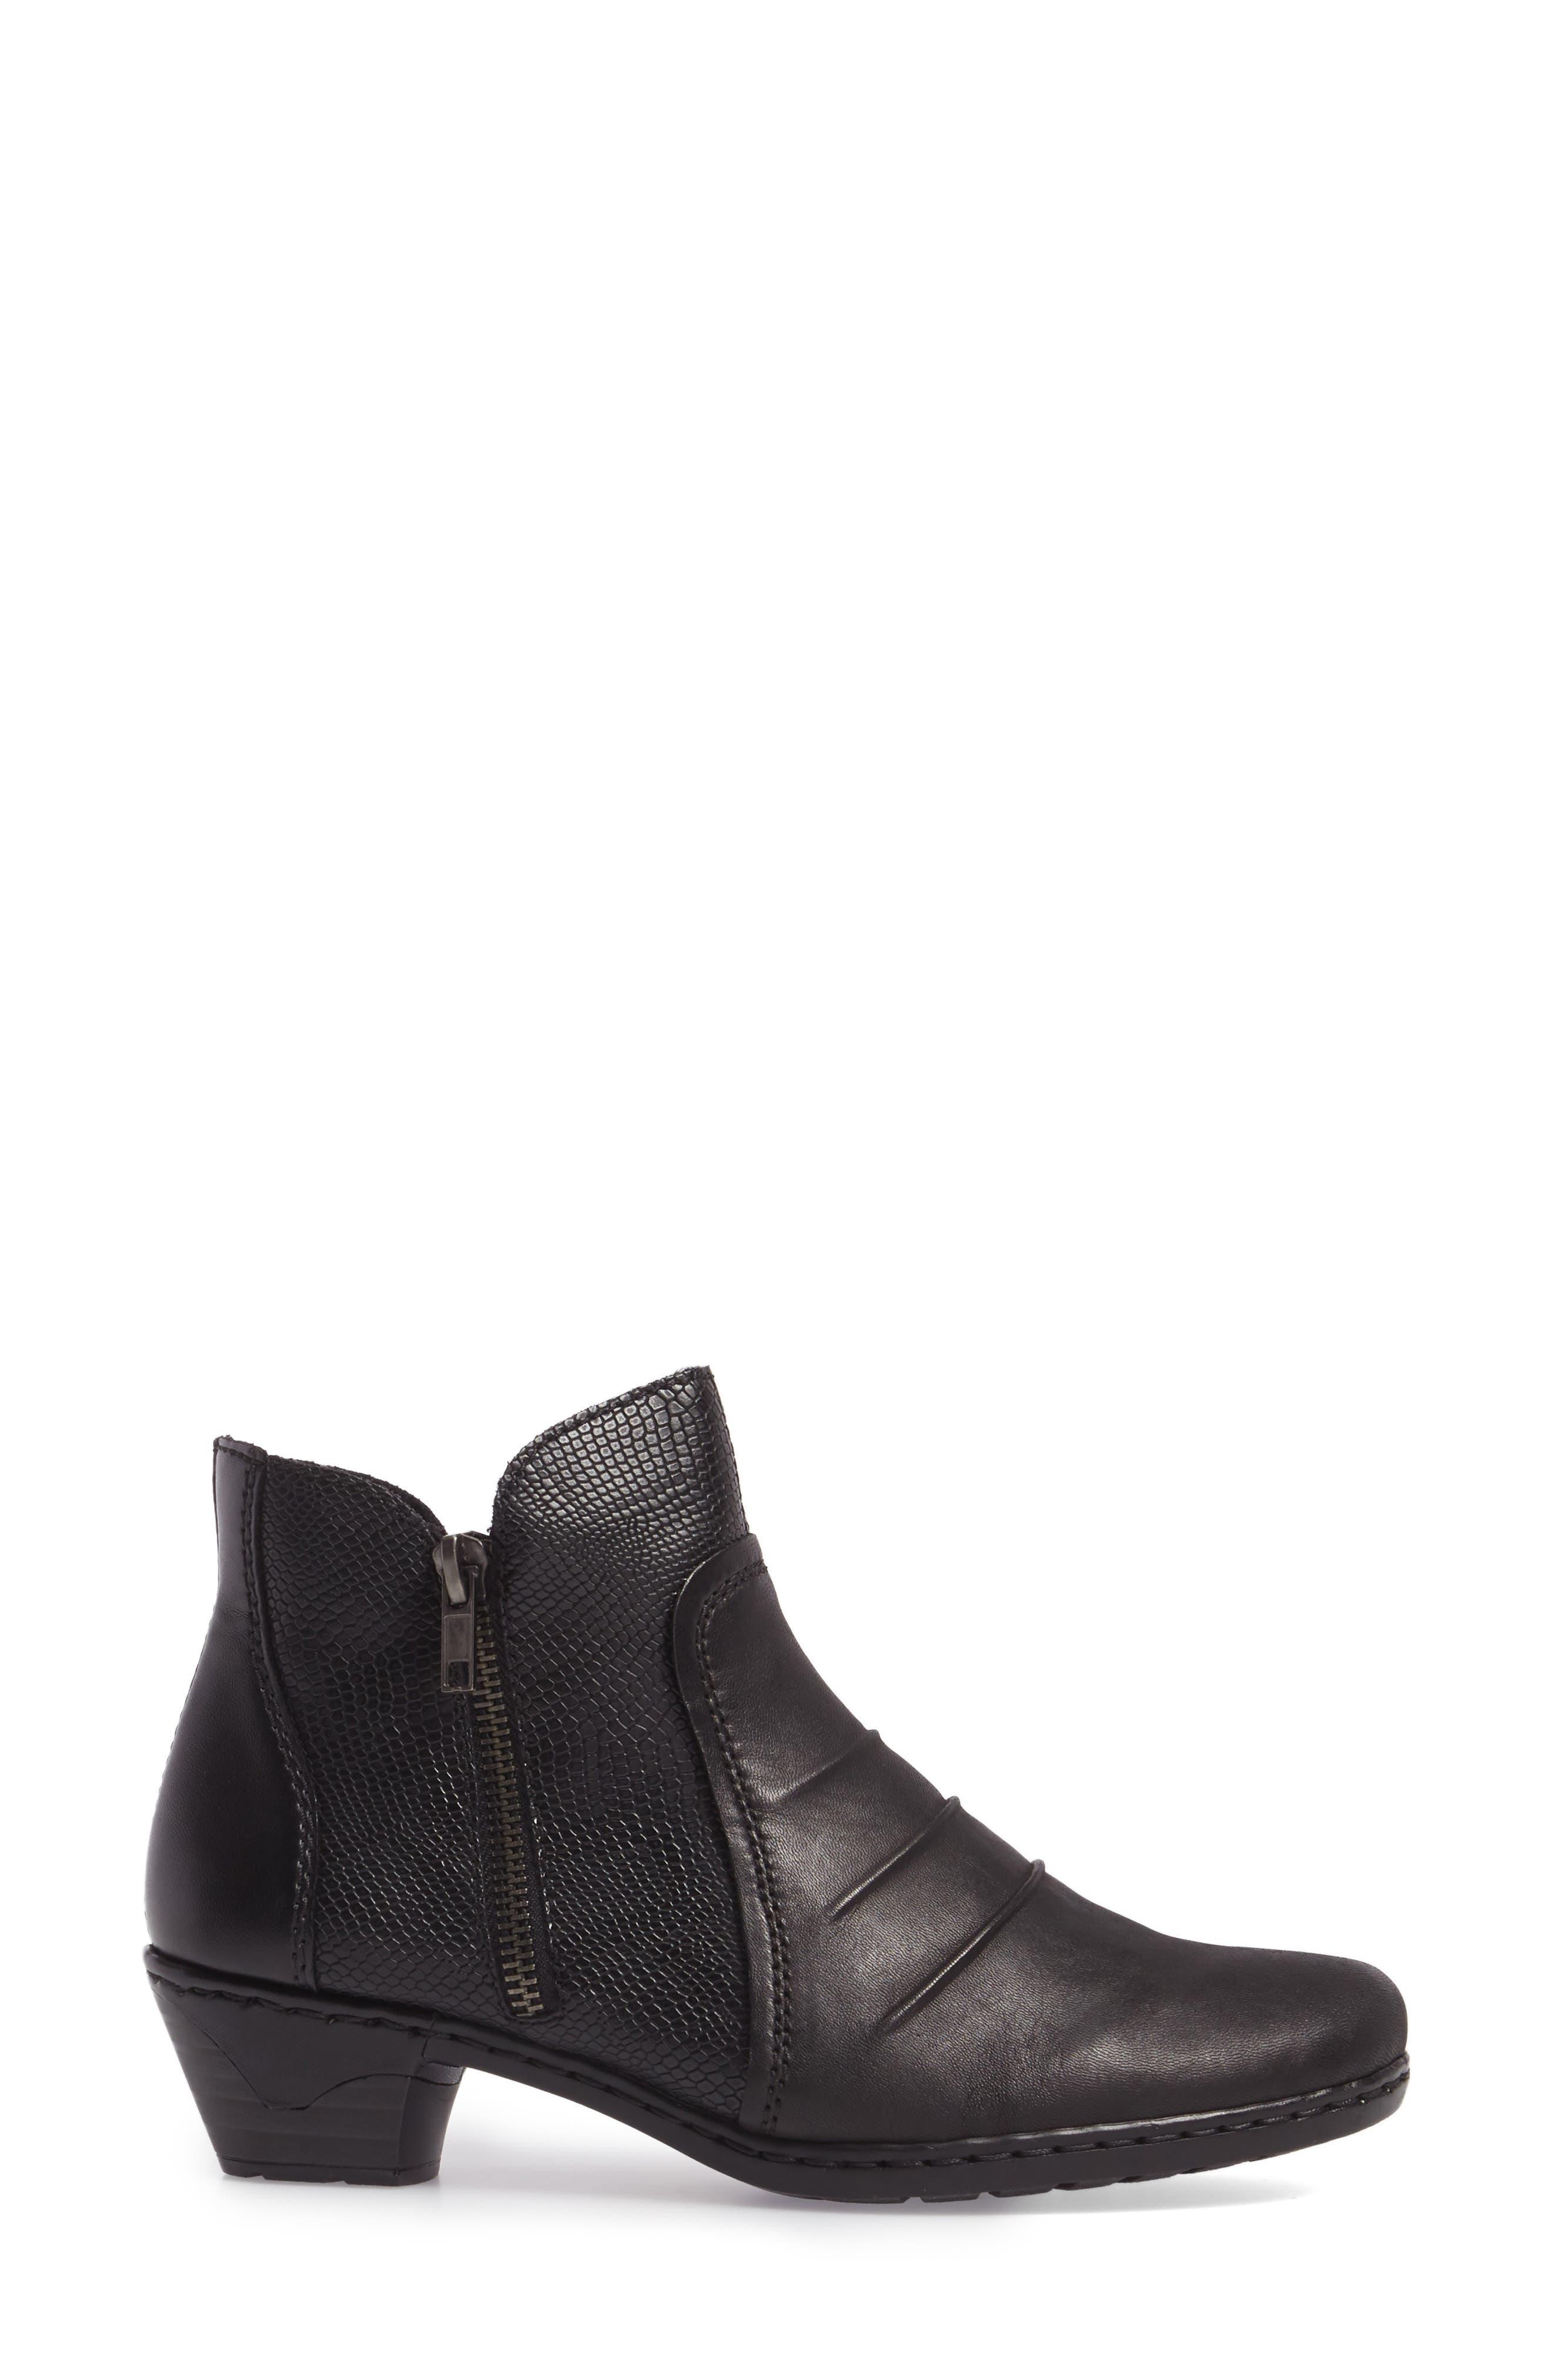 Lynn 62 Bootie,                             Alternate thumbnail 3, color,                             Schwarz Nero Leather